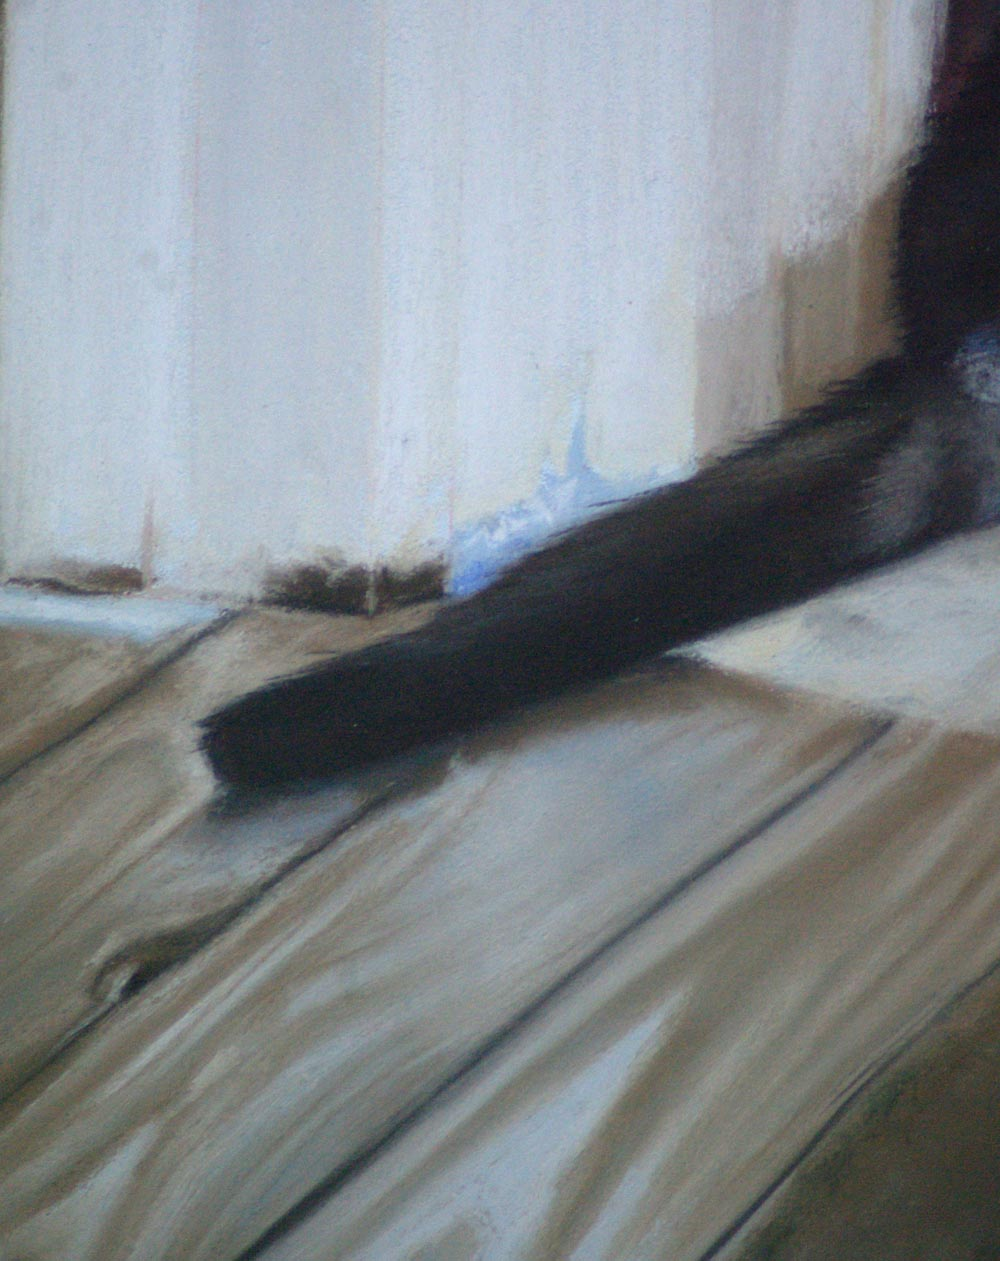 portrait of black cat on floor detail